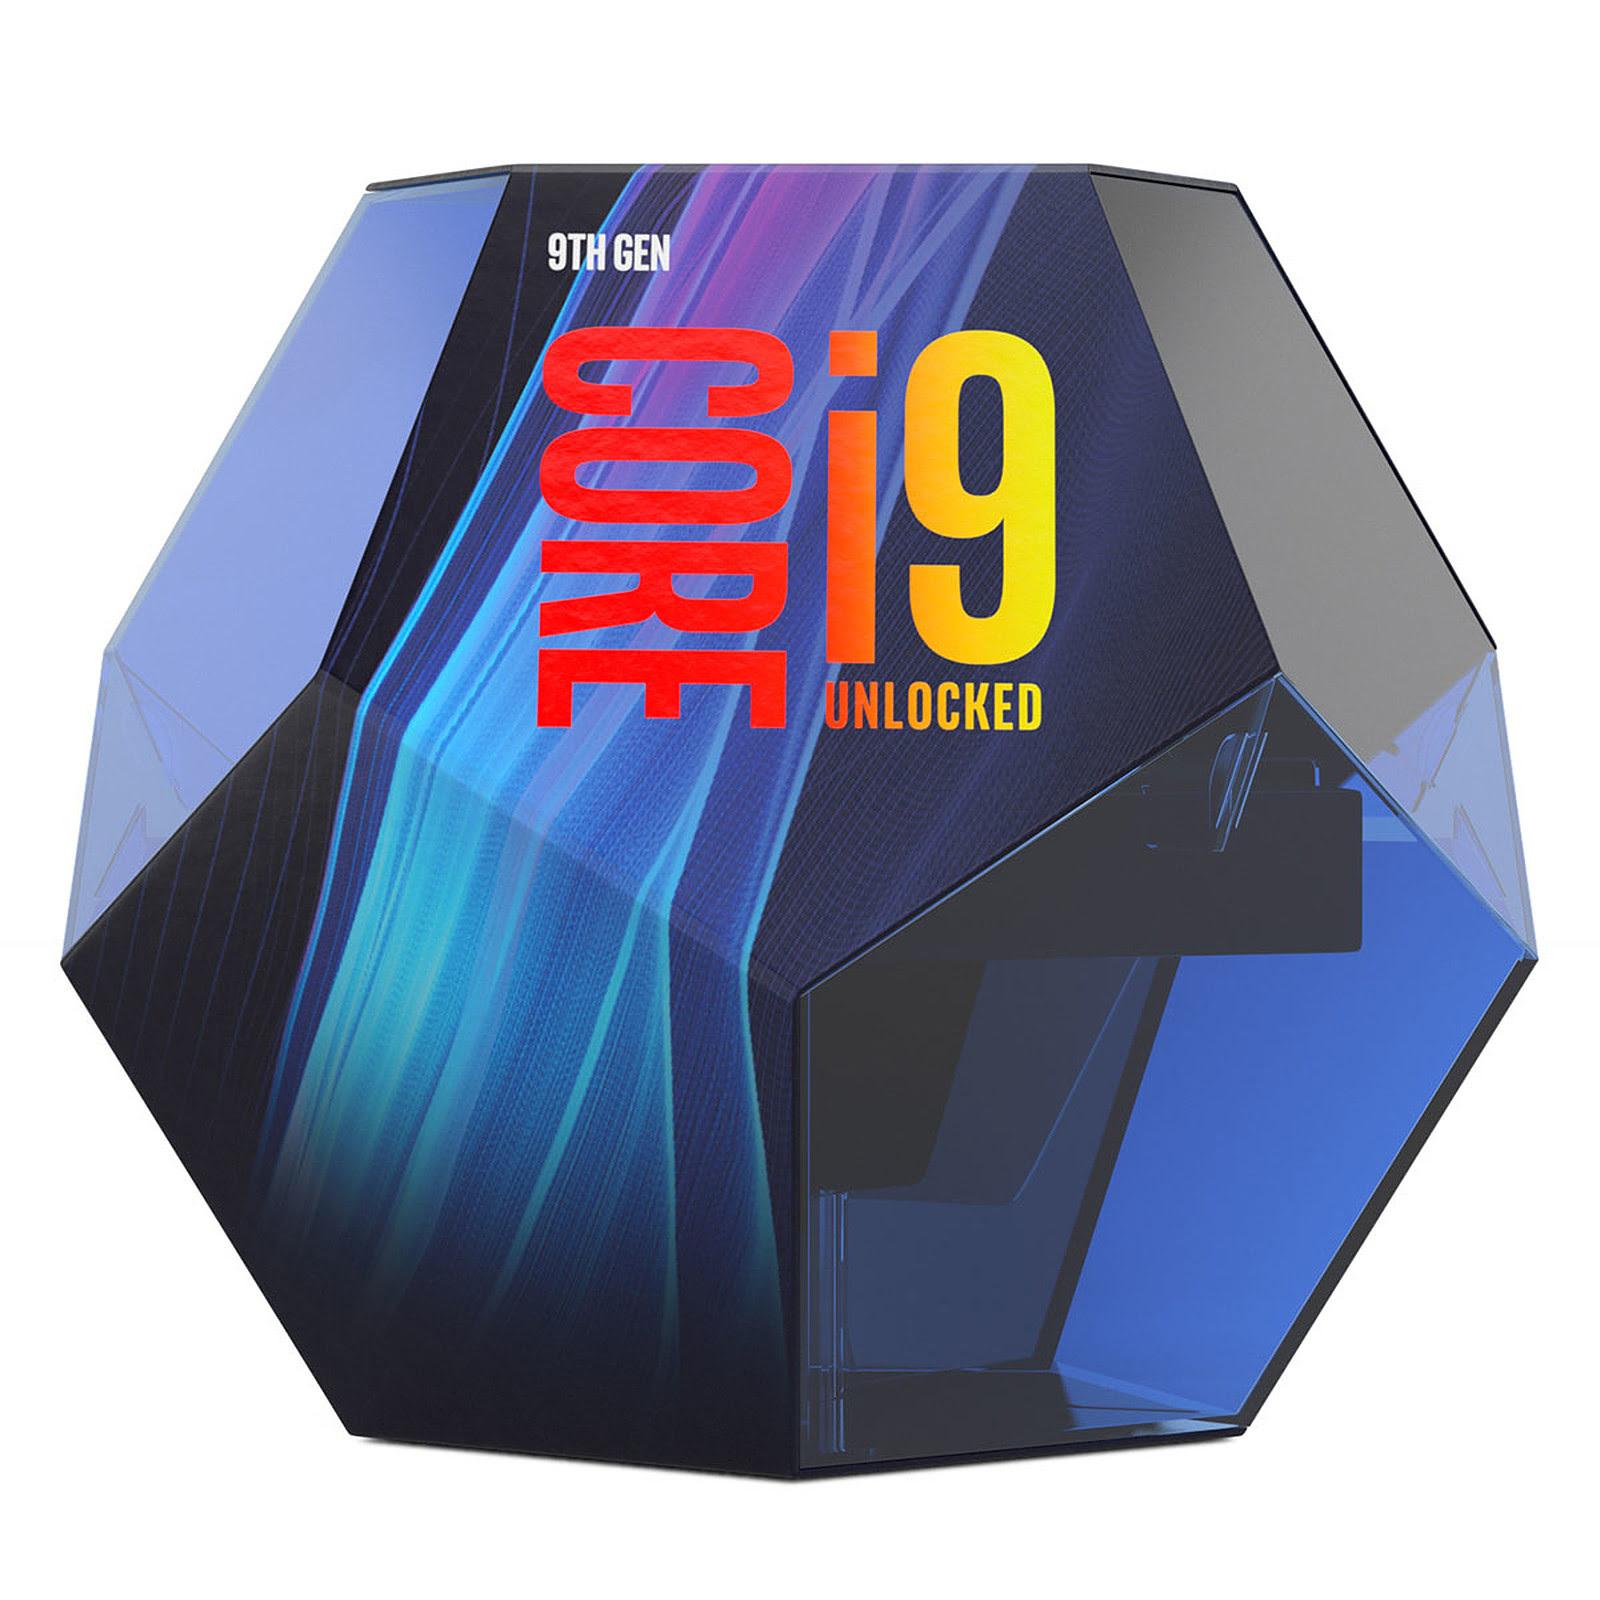 Intel Core i9-9900KS - 3.6GHz/LGA1151(2017)/Ss Vent./BOX (BX80684I99900KS) - Achat / Vente Processeur sur Cybertek.fr - 2